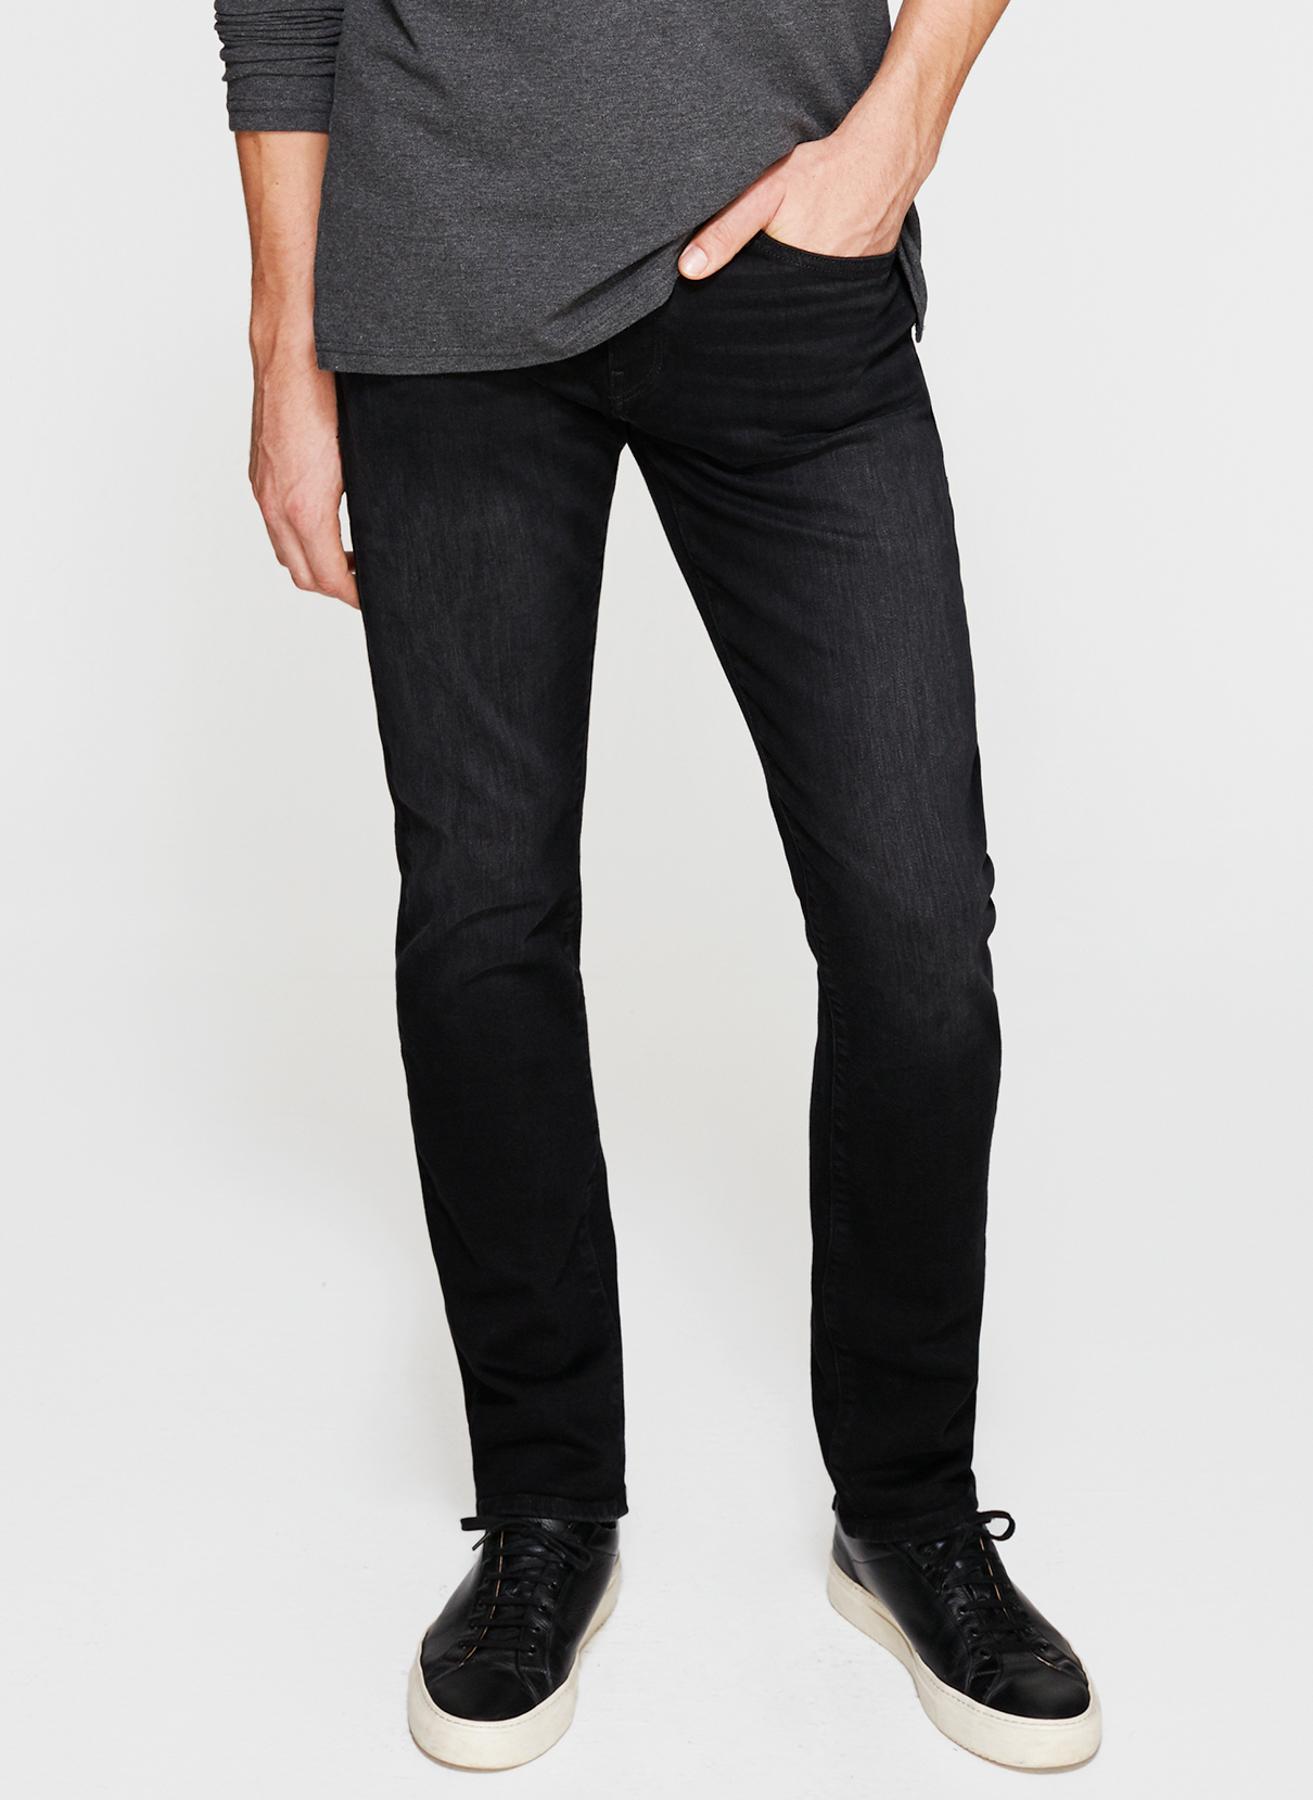 Mavi Klasik Pantolon 32-34 5001634317018 Ürün Resmi